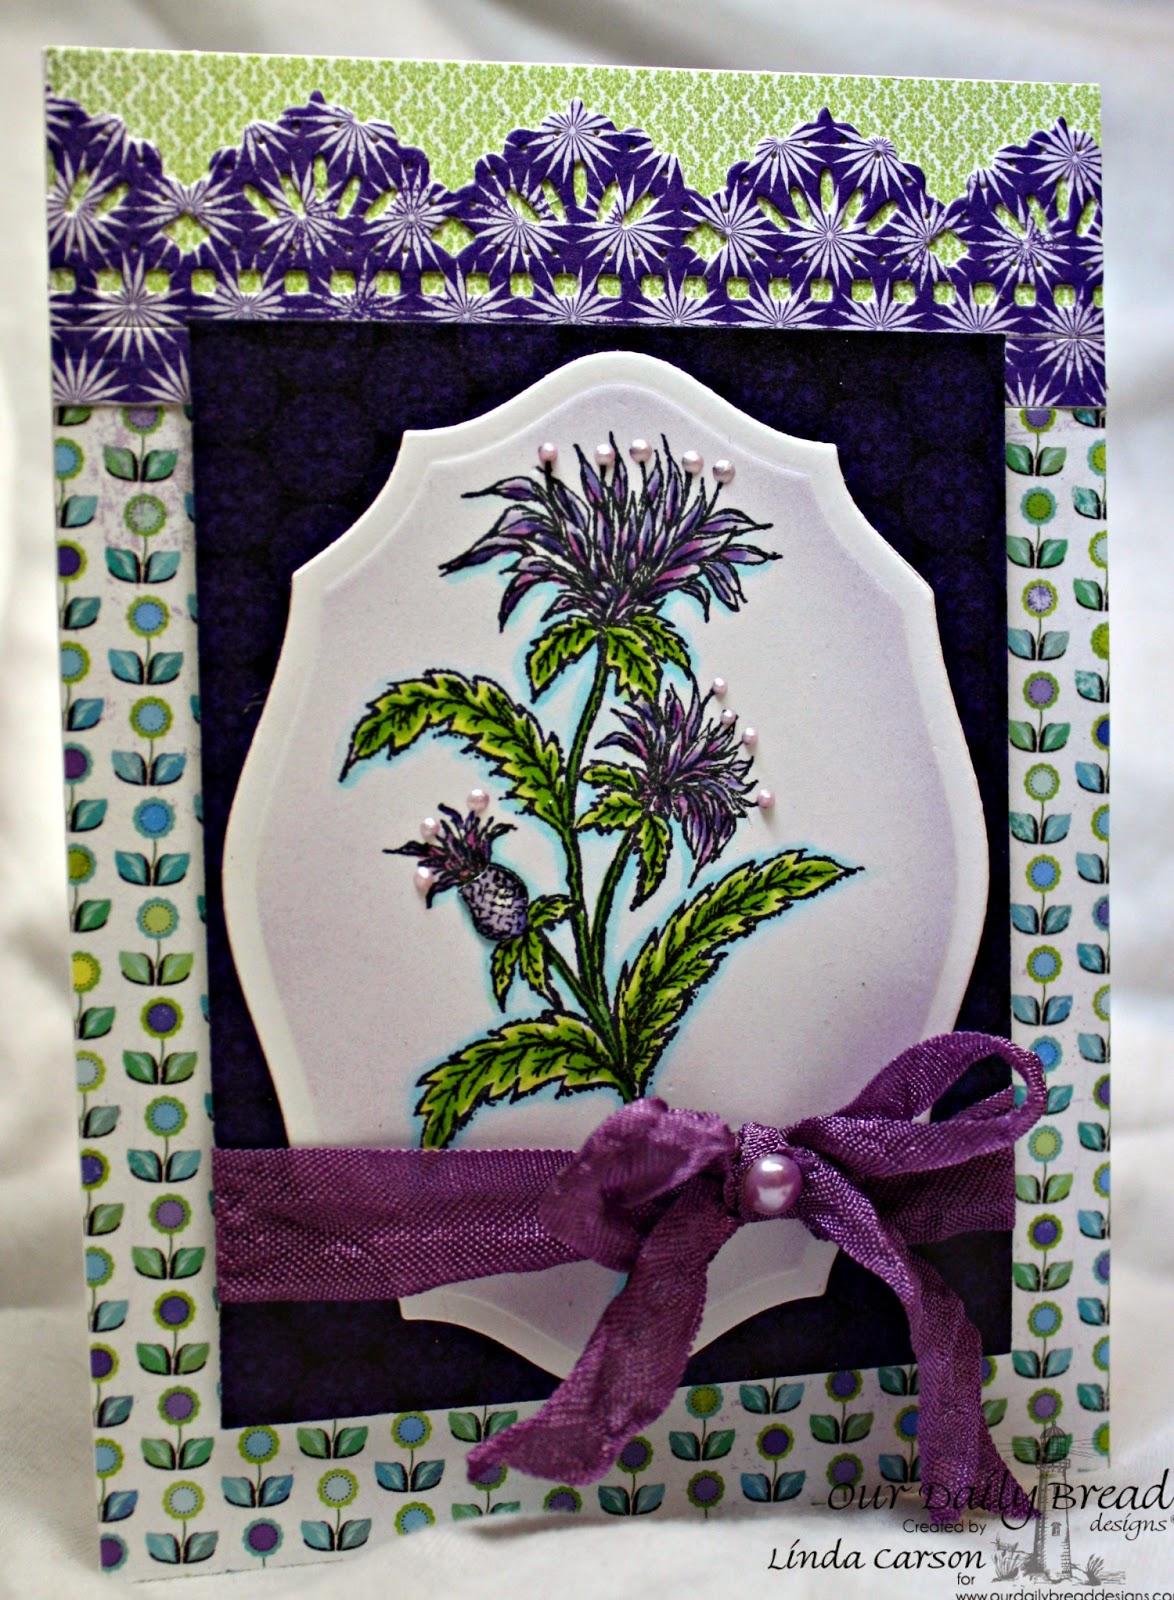 Our Daily Bread Designs, Bee Balm, Beautiful Borders dies, Elegant Oval Dies, designer Linda Carson